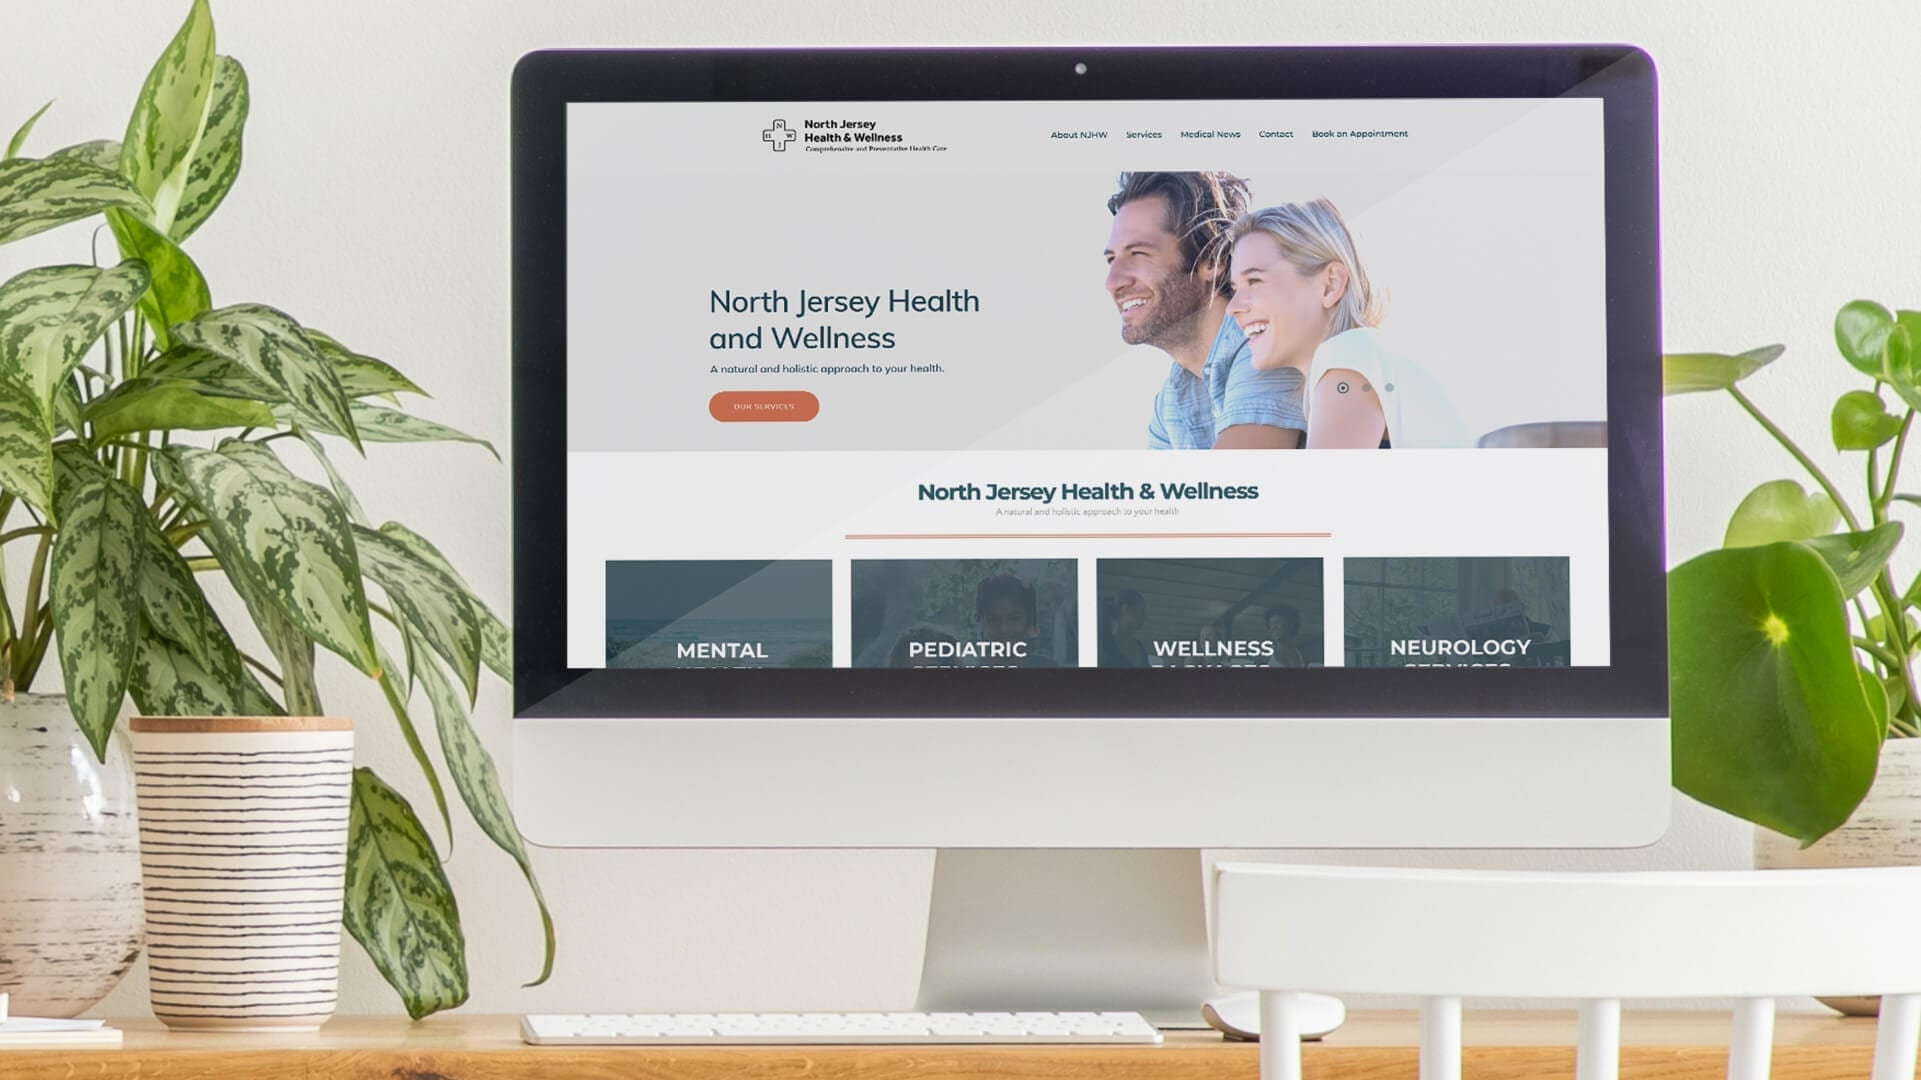 North Jersey Health & Wellness 1